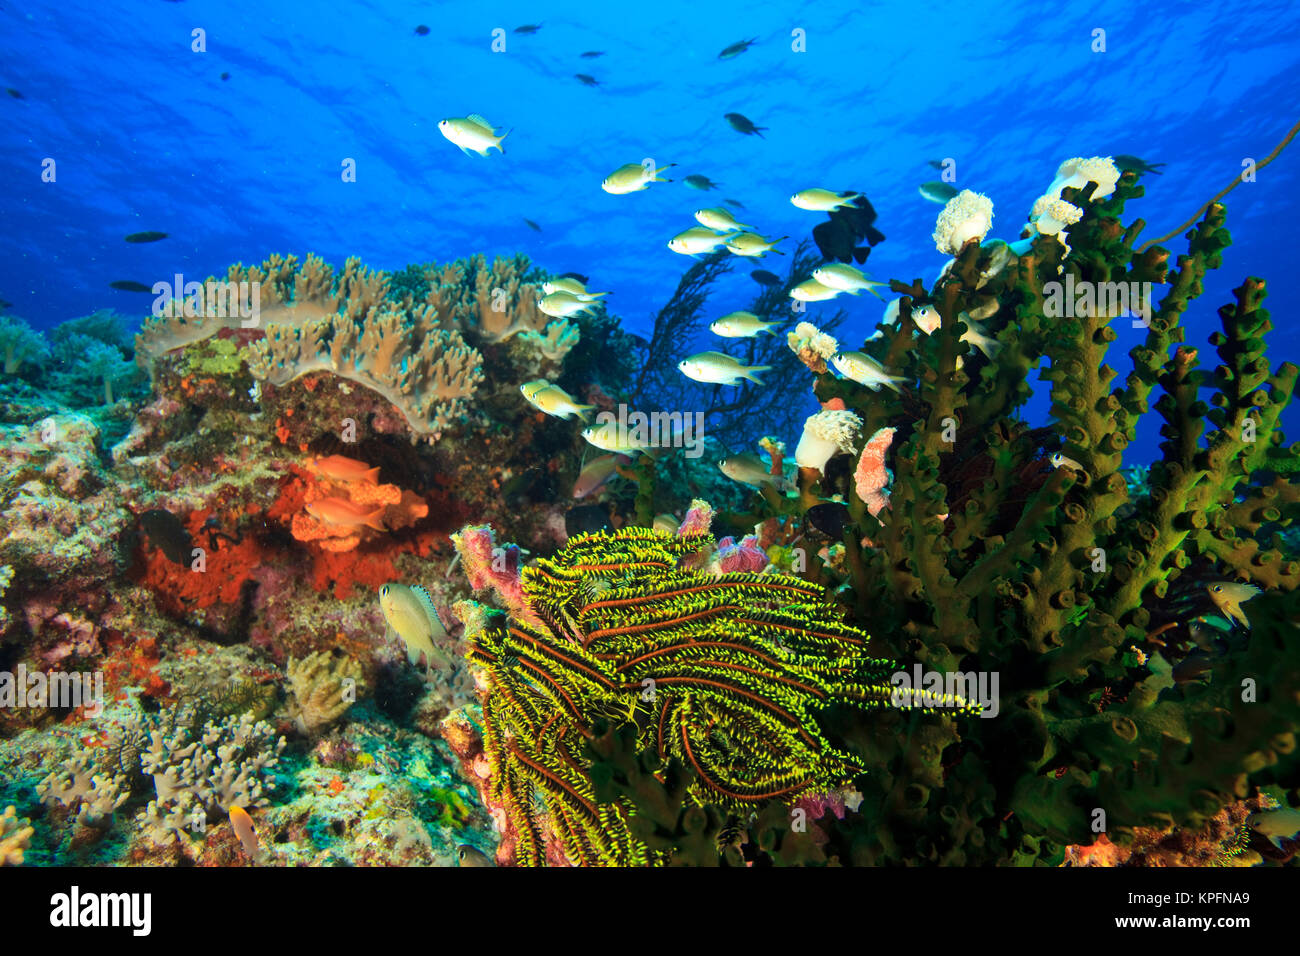 Bluegreen Chromis (Chromis virida) near Tubastrea Coral (Tubastrea micrantha) near Lewolin Village, Selat Boleng - Stock Image